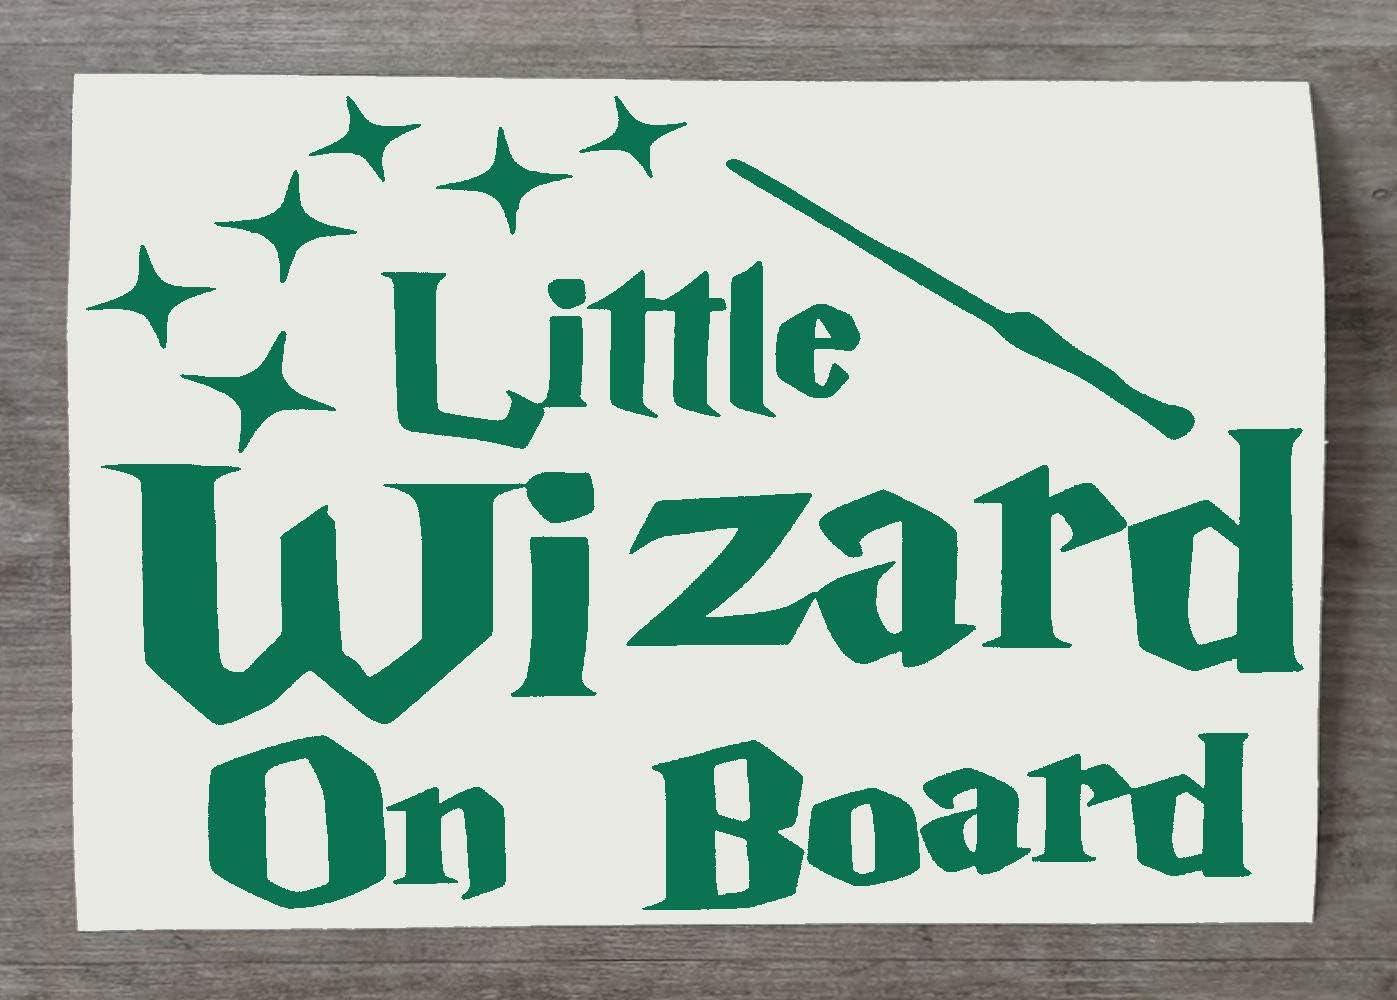 Little Wizard on Board Car Sticker HSS693 Fun Harry Potter Inspired Baby On Board Vinyl Decal for Bumper Window Red